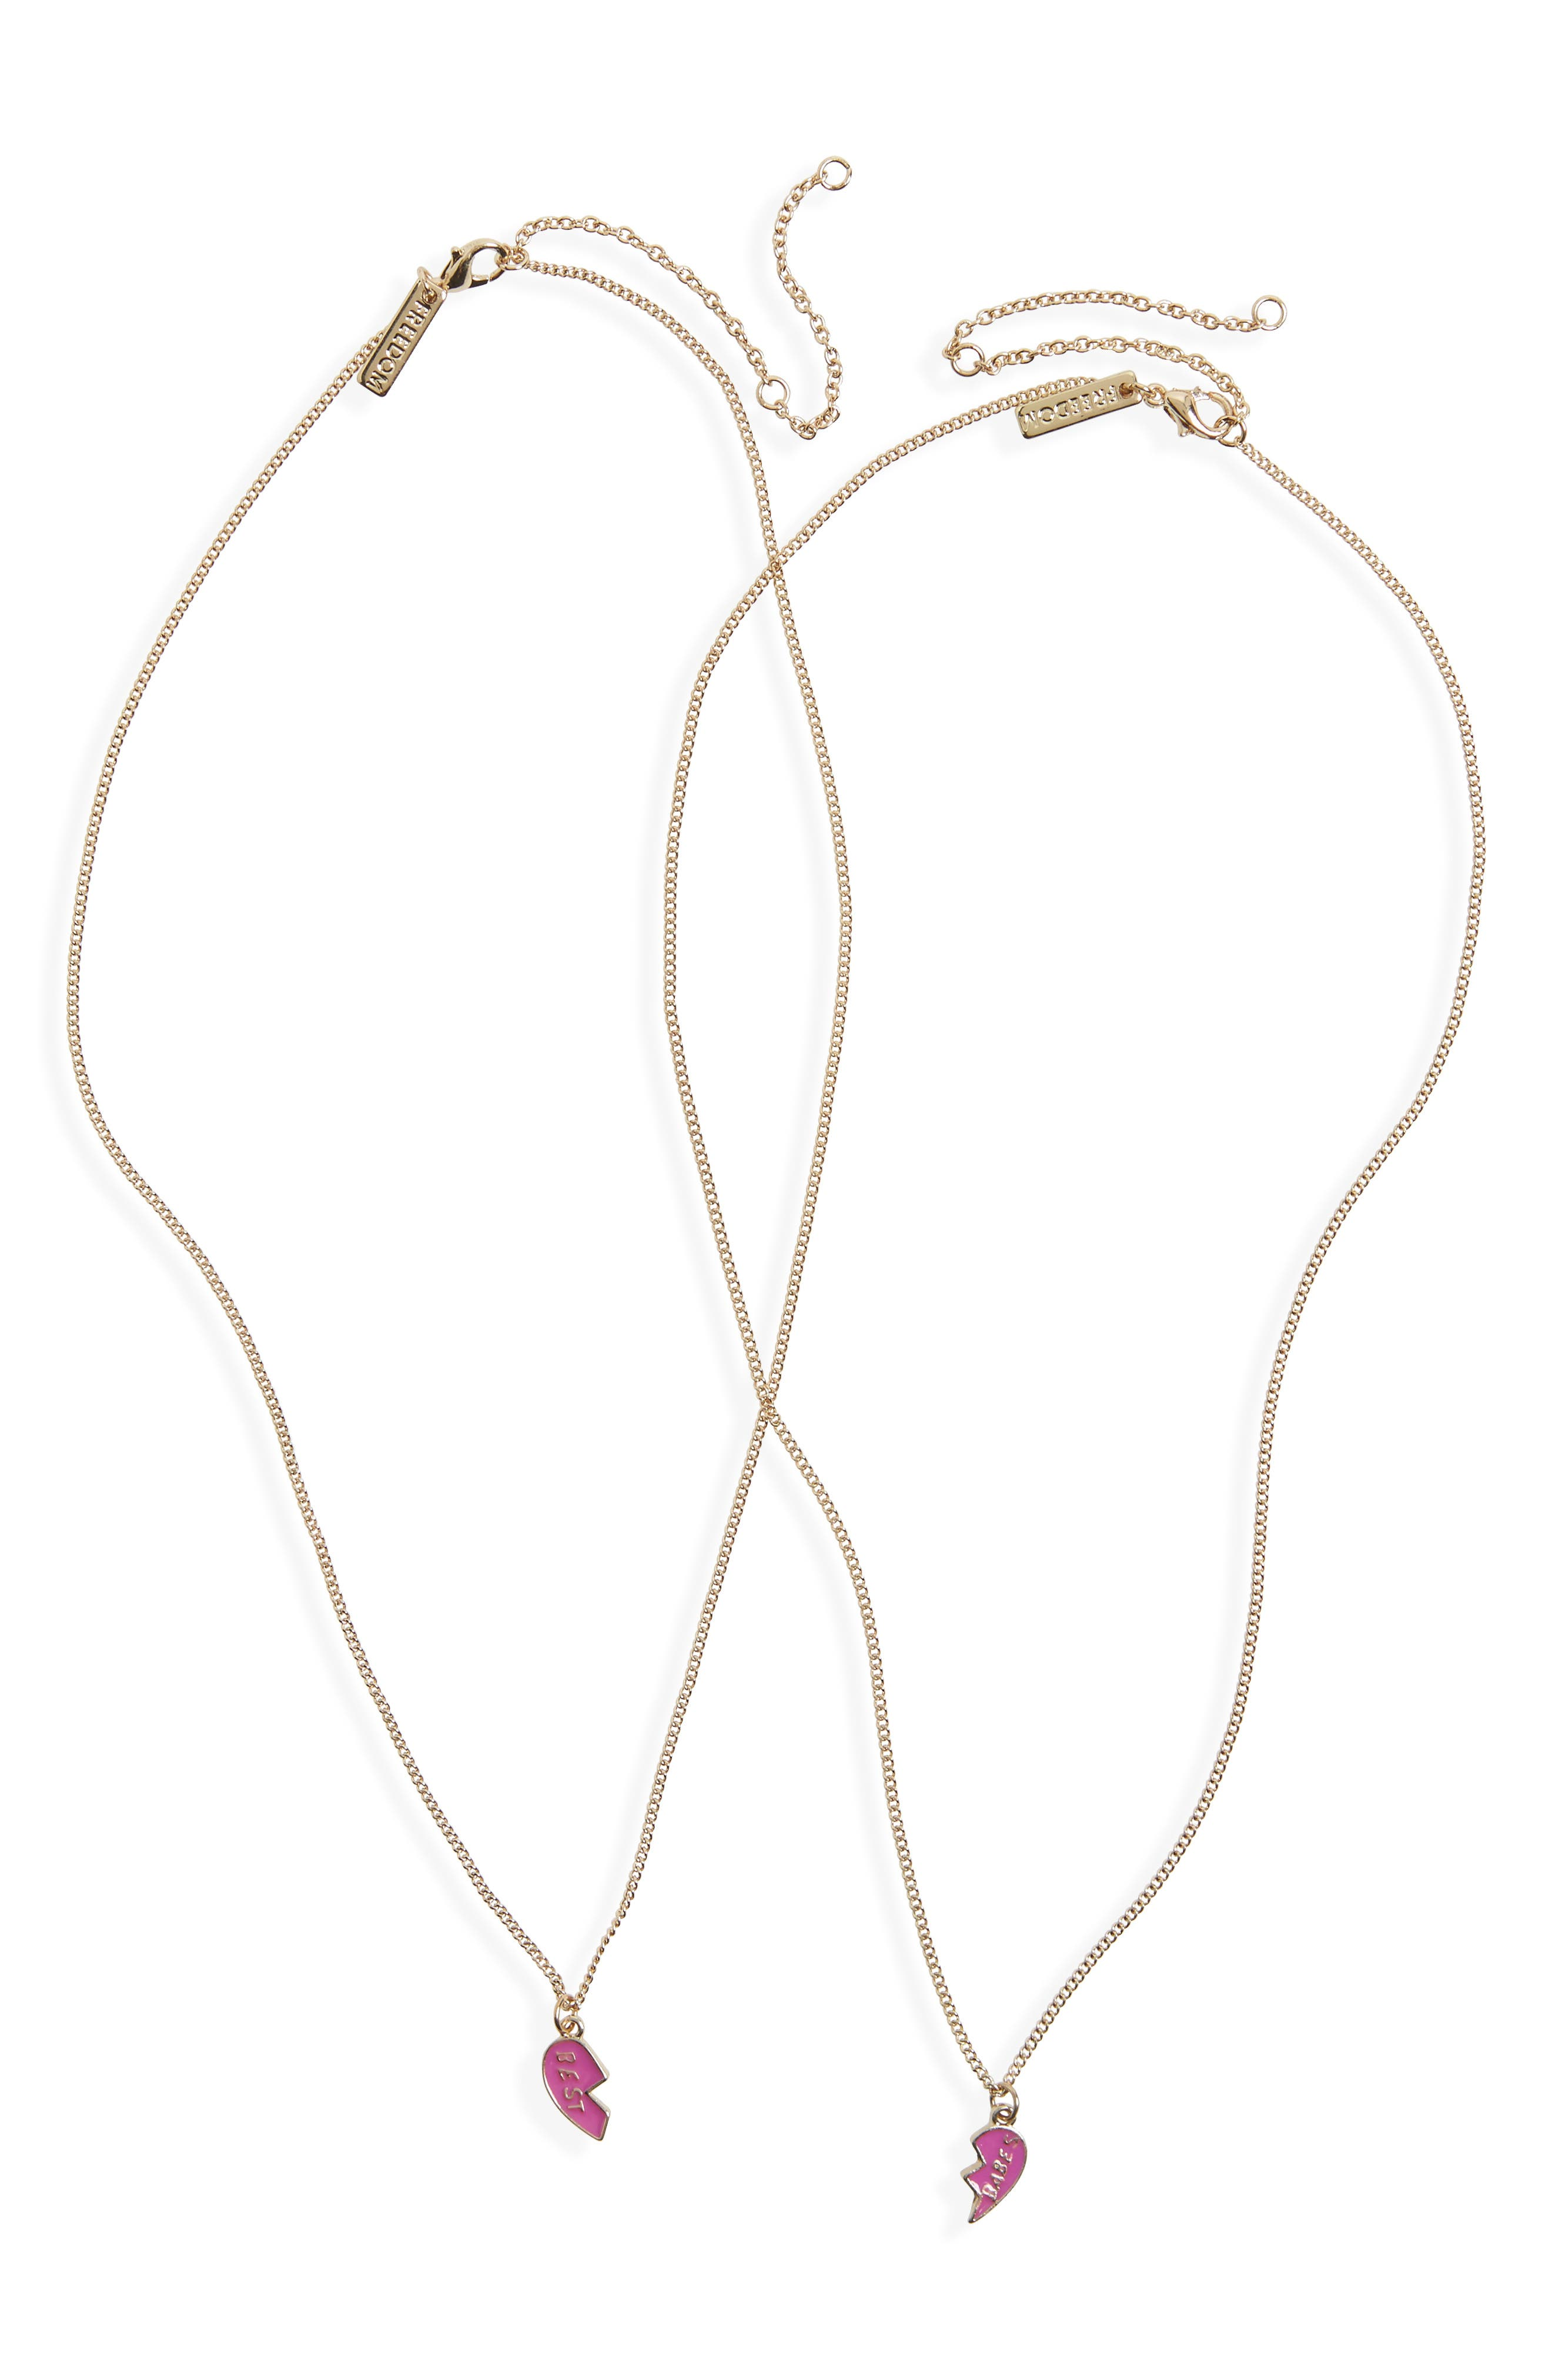 Topshop Best Babes Broken Heart Pendant Necklace Set